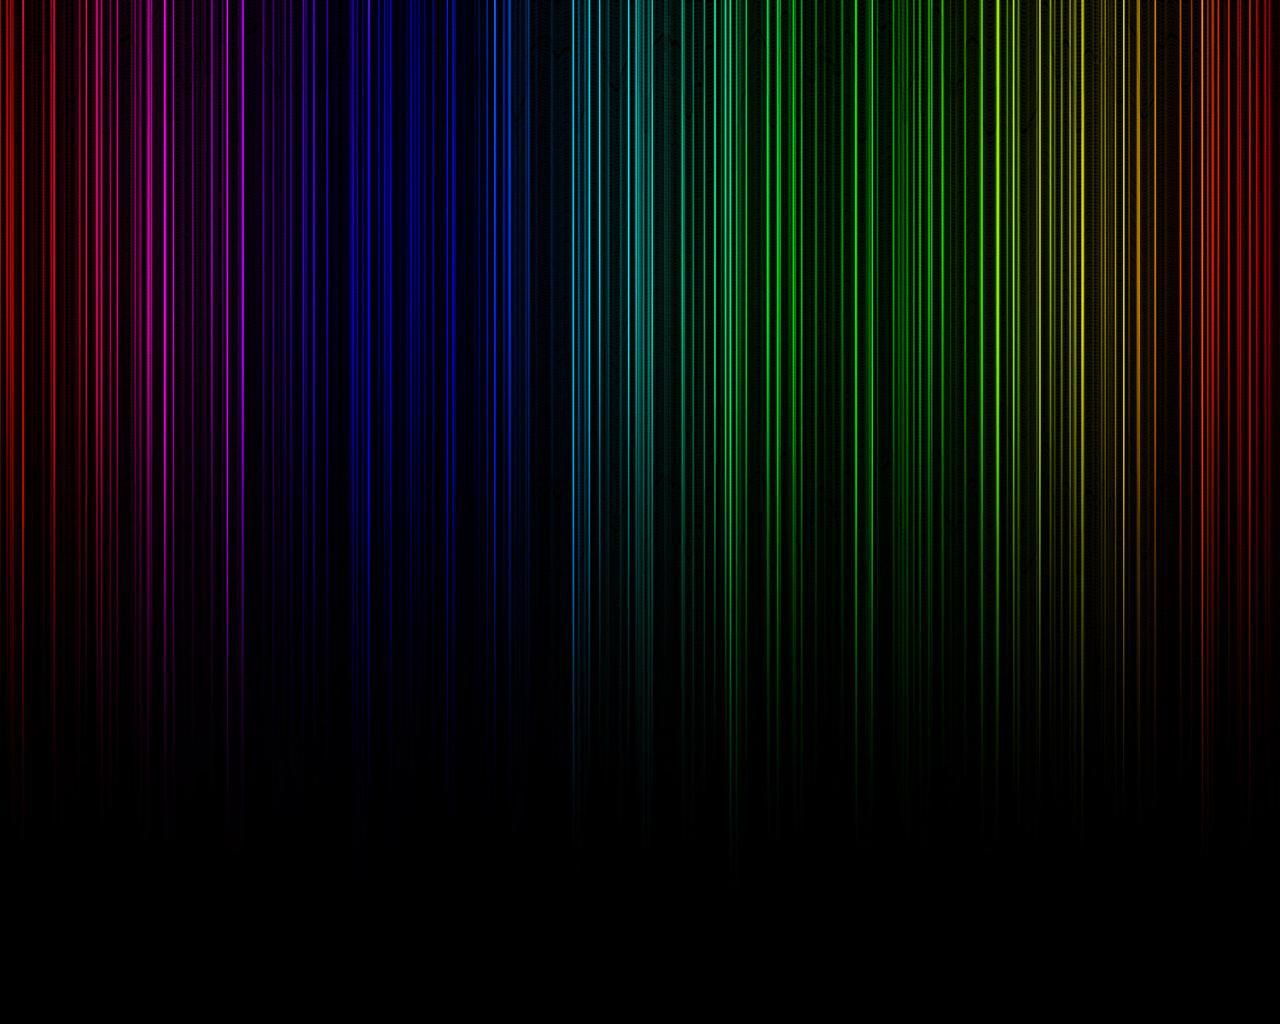 Стол красивые текстура цвета 1280x1024